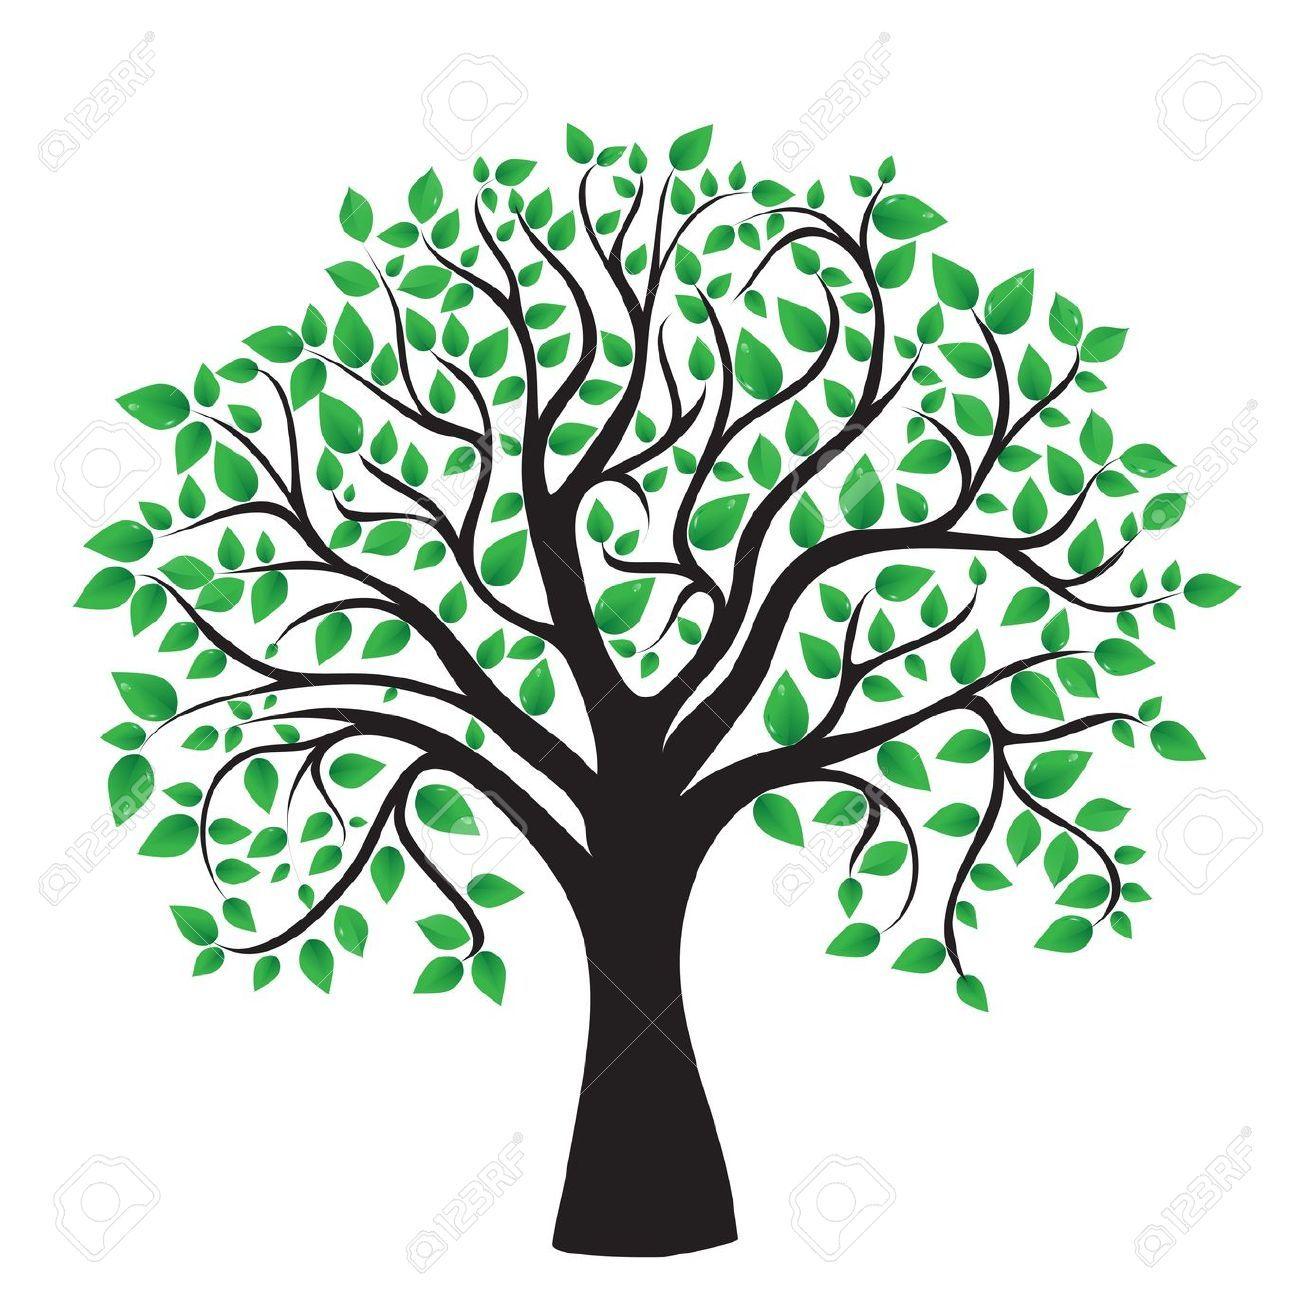 Clipart Tree Vector.